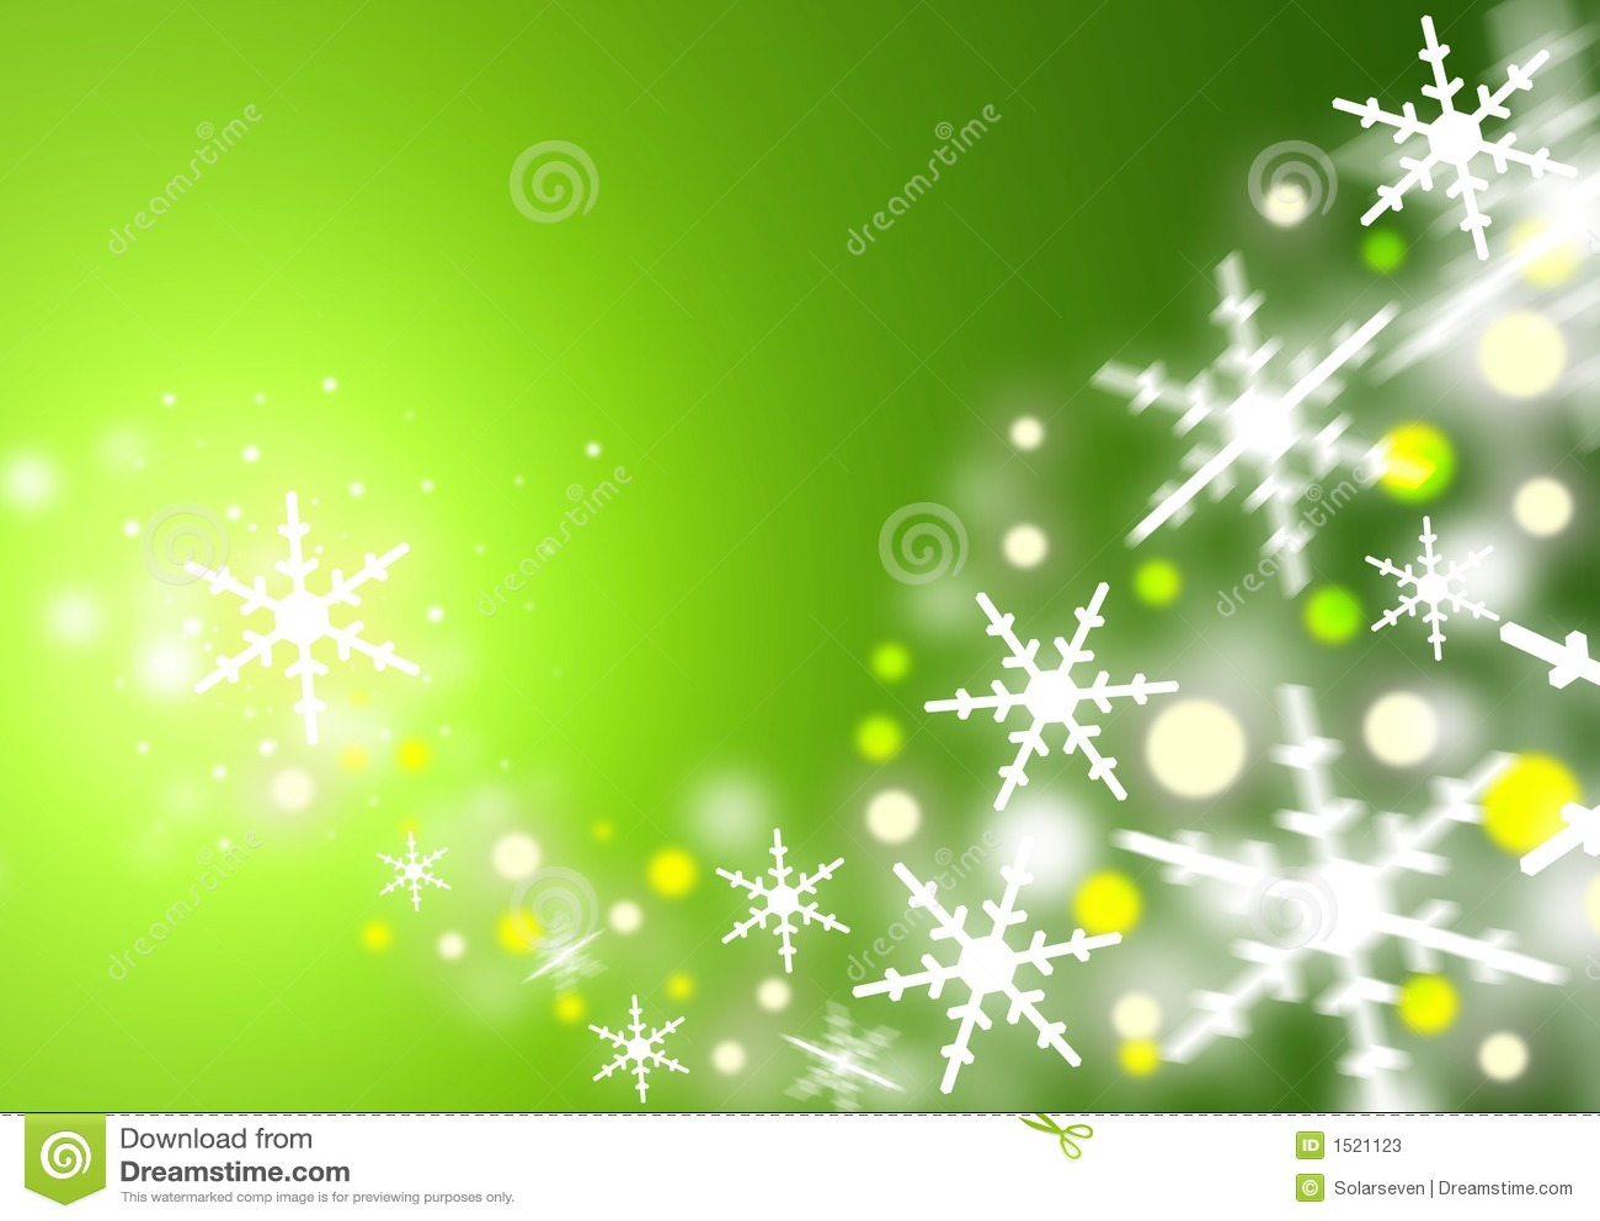 Christmas Green Stock Photos Image 1521123